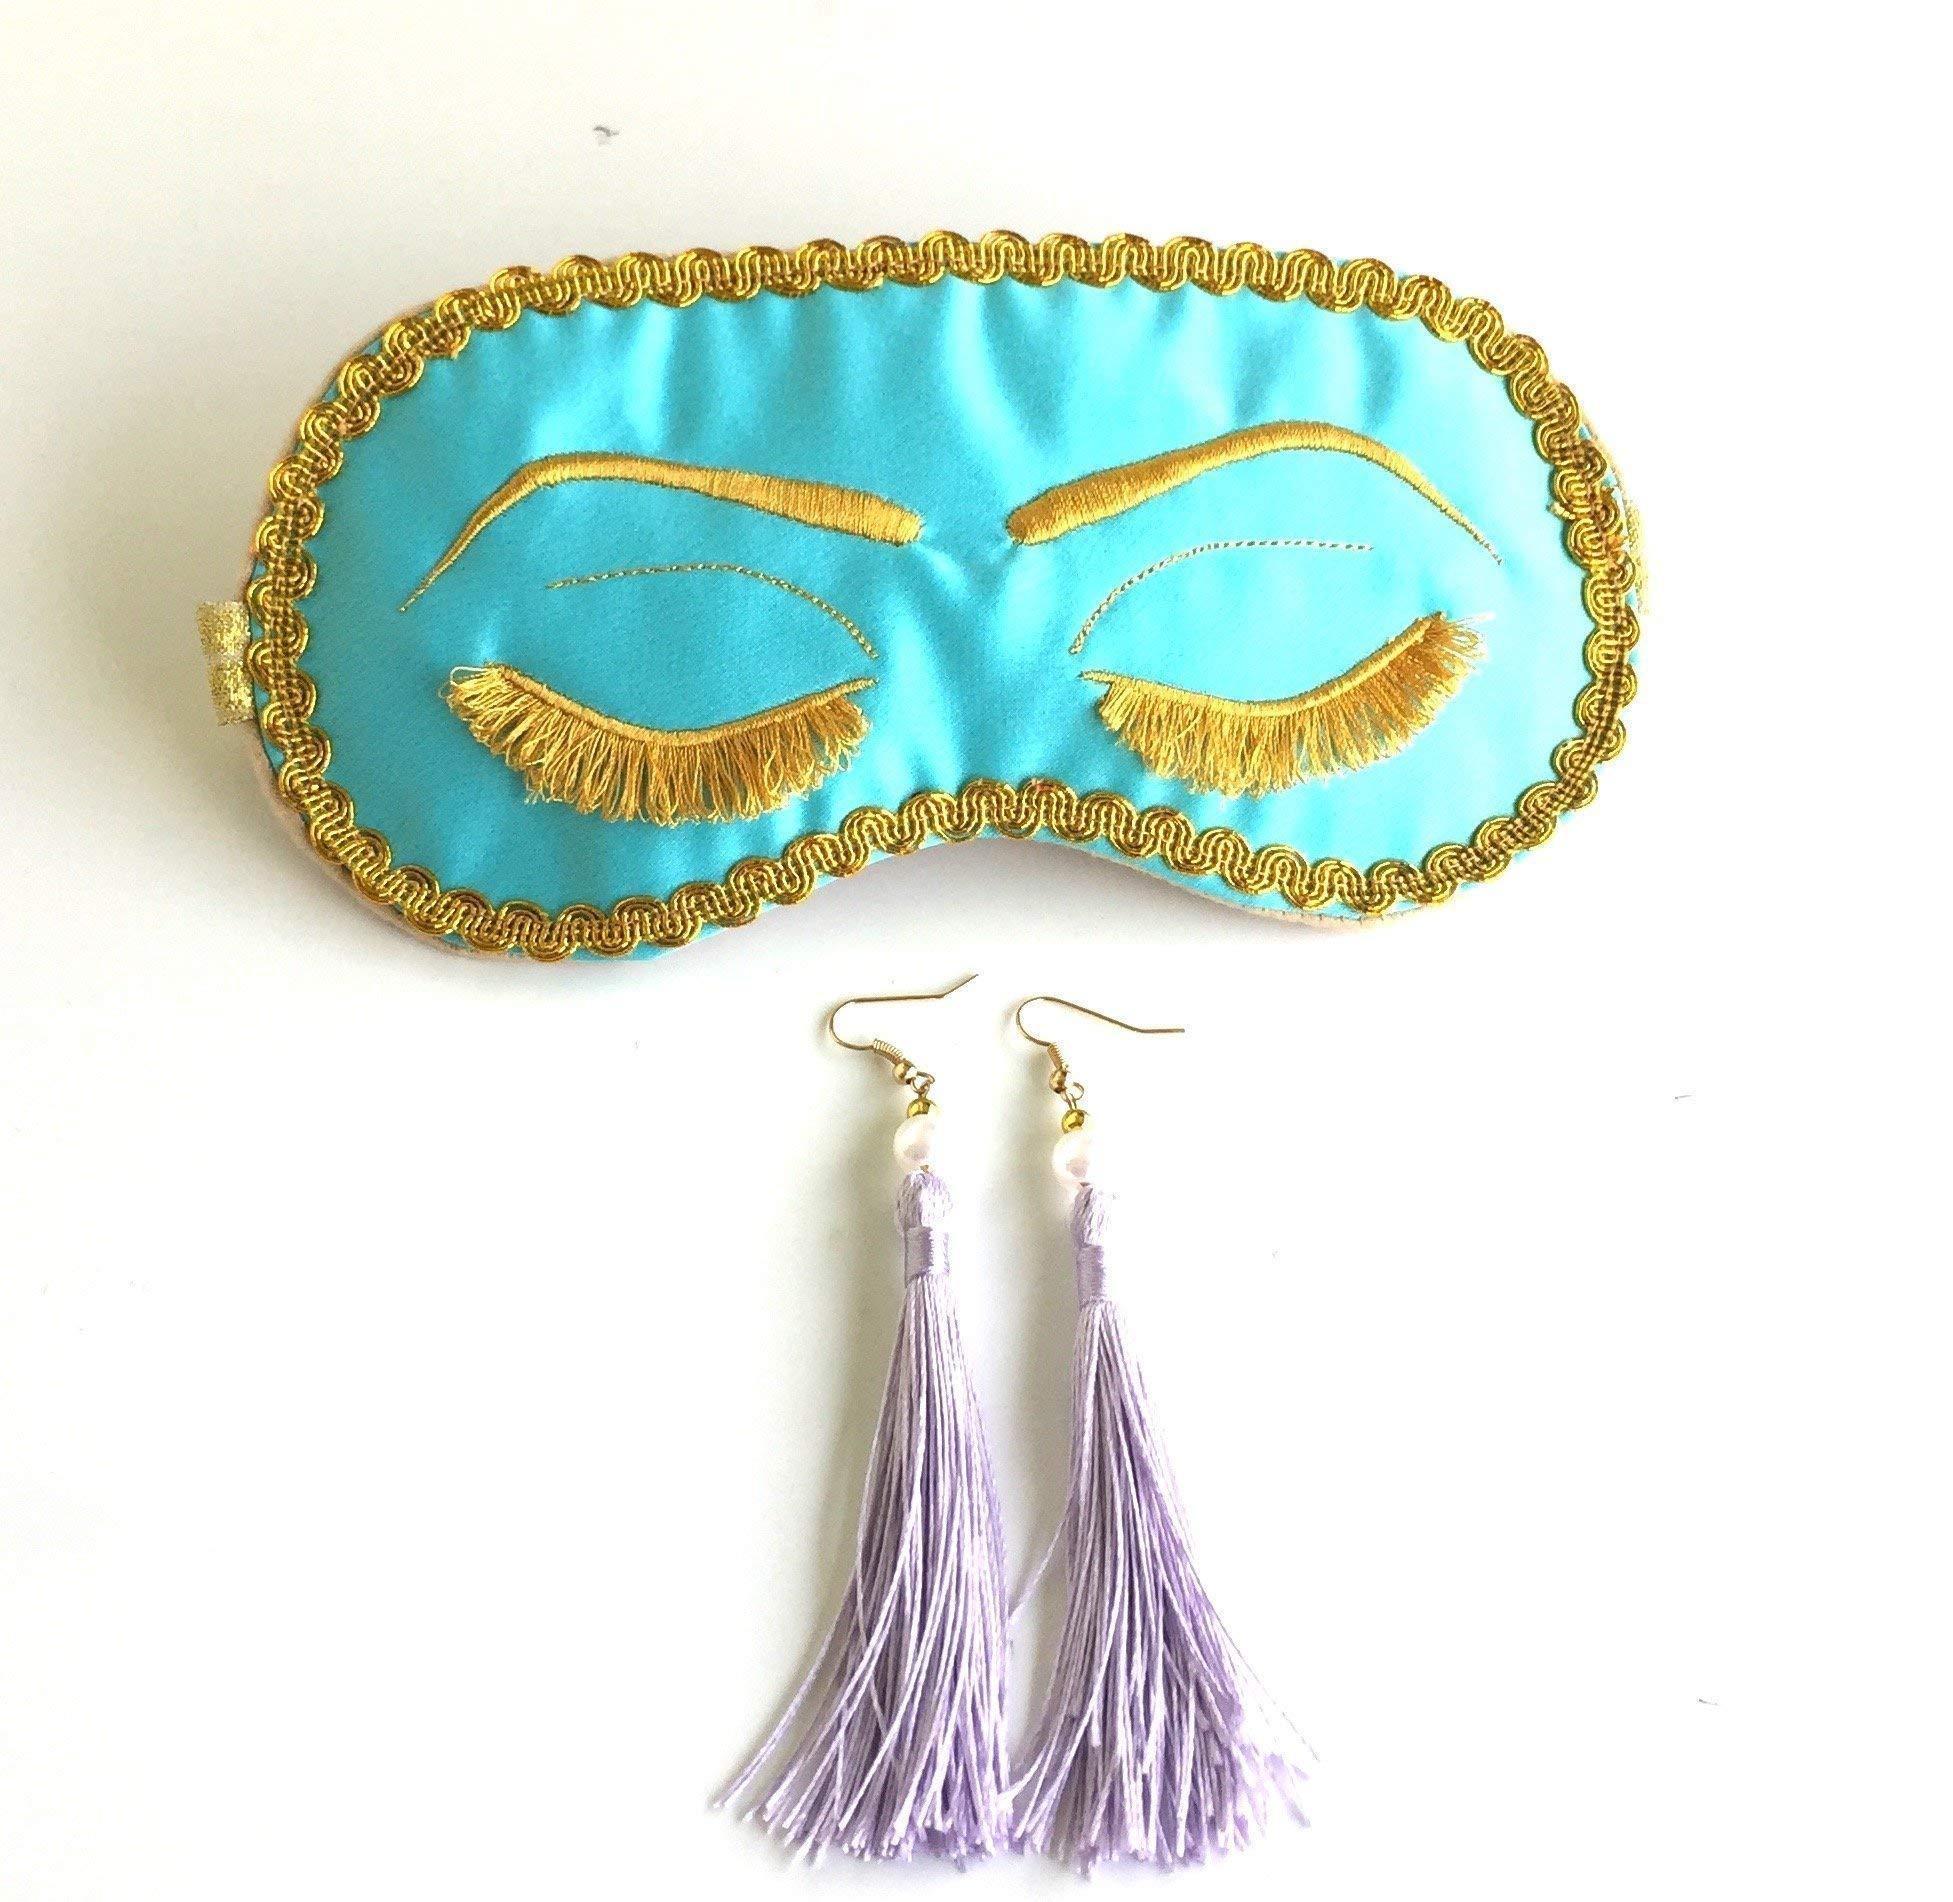 Handmade Breakfast at Tiffany's Eyelashes Sleep Mask Tassel Ear Plugs Set Bachelorette Party Mask.